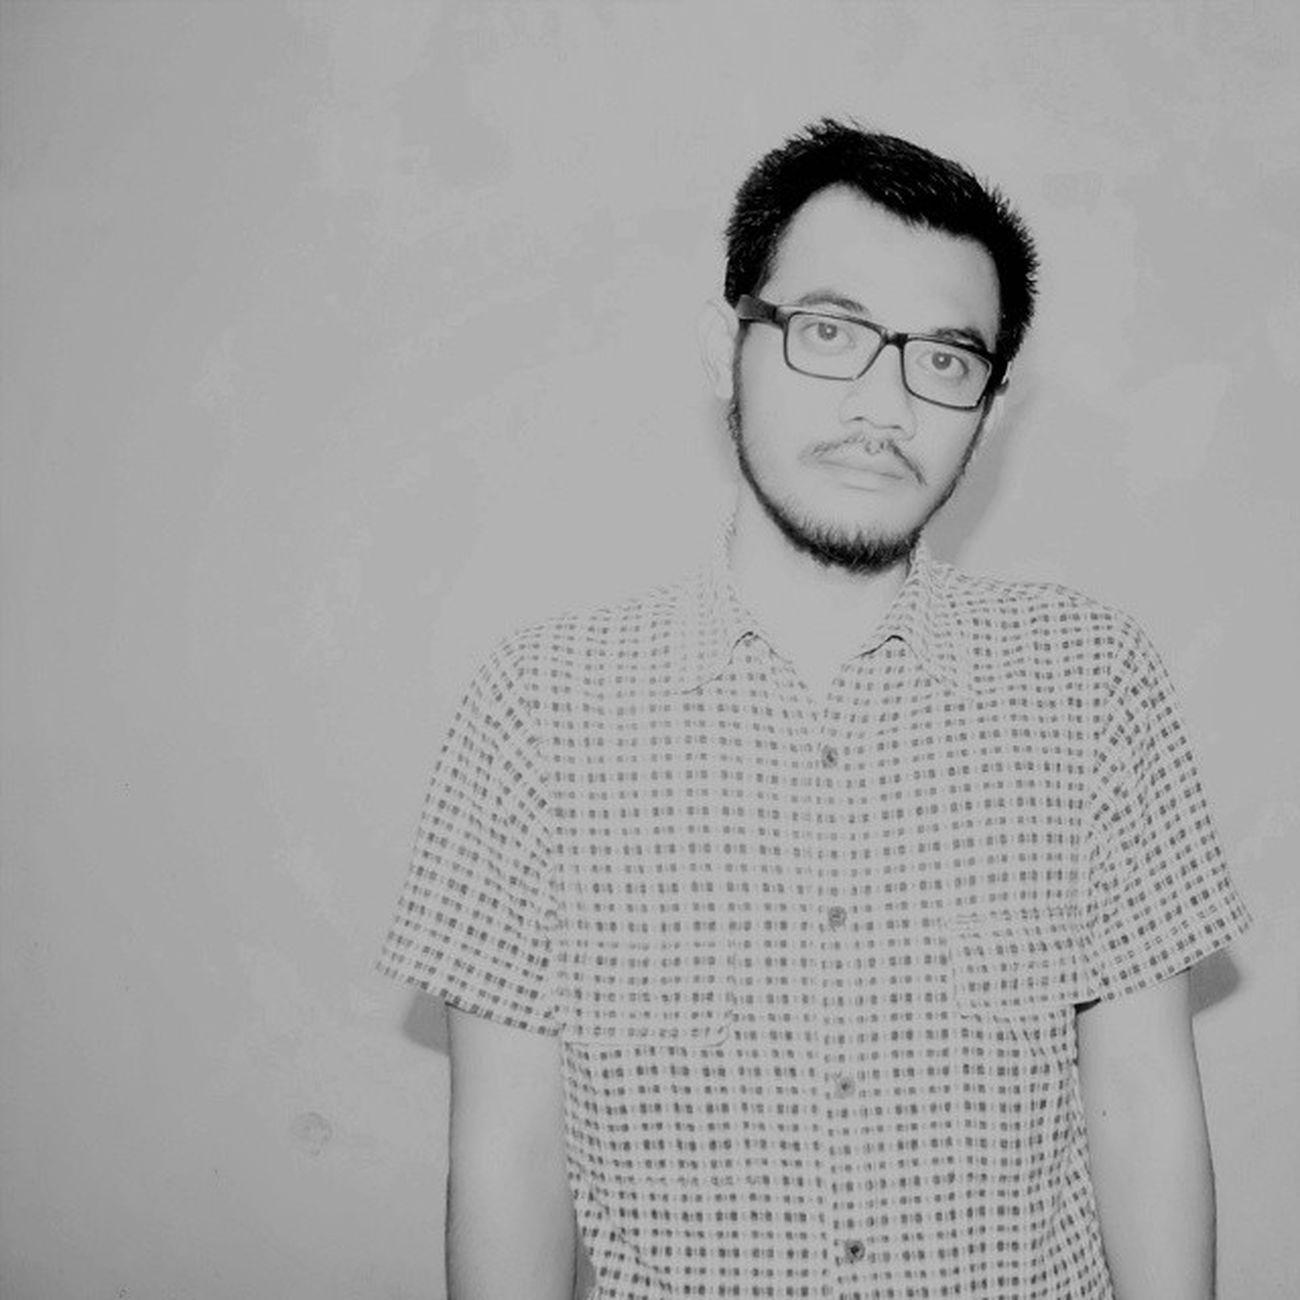 Me Selfie Instagood Instaselfie selfietime face portrait igers fun ootd fashion style pants shirt